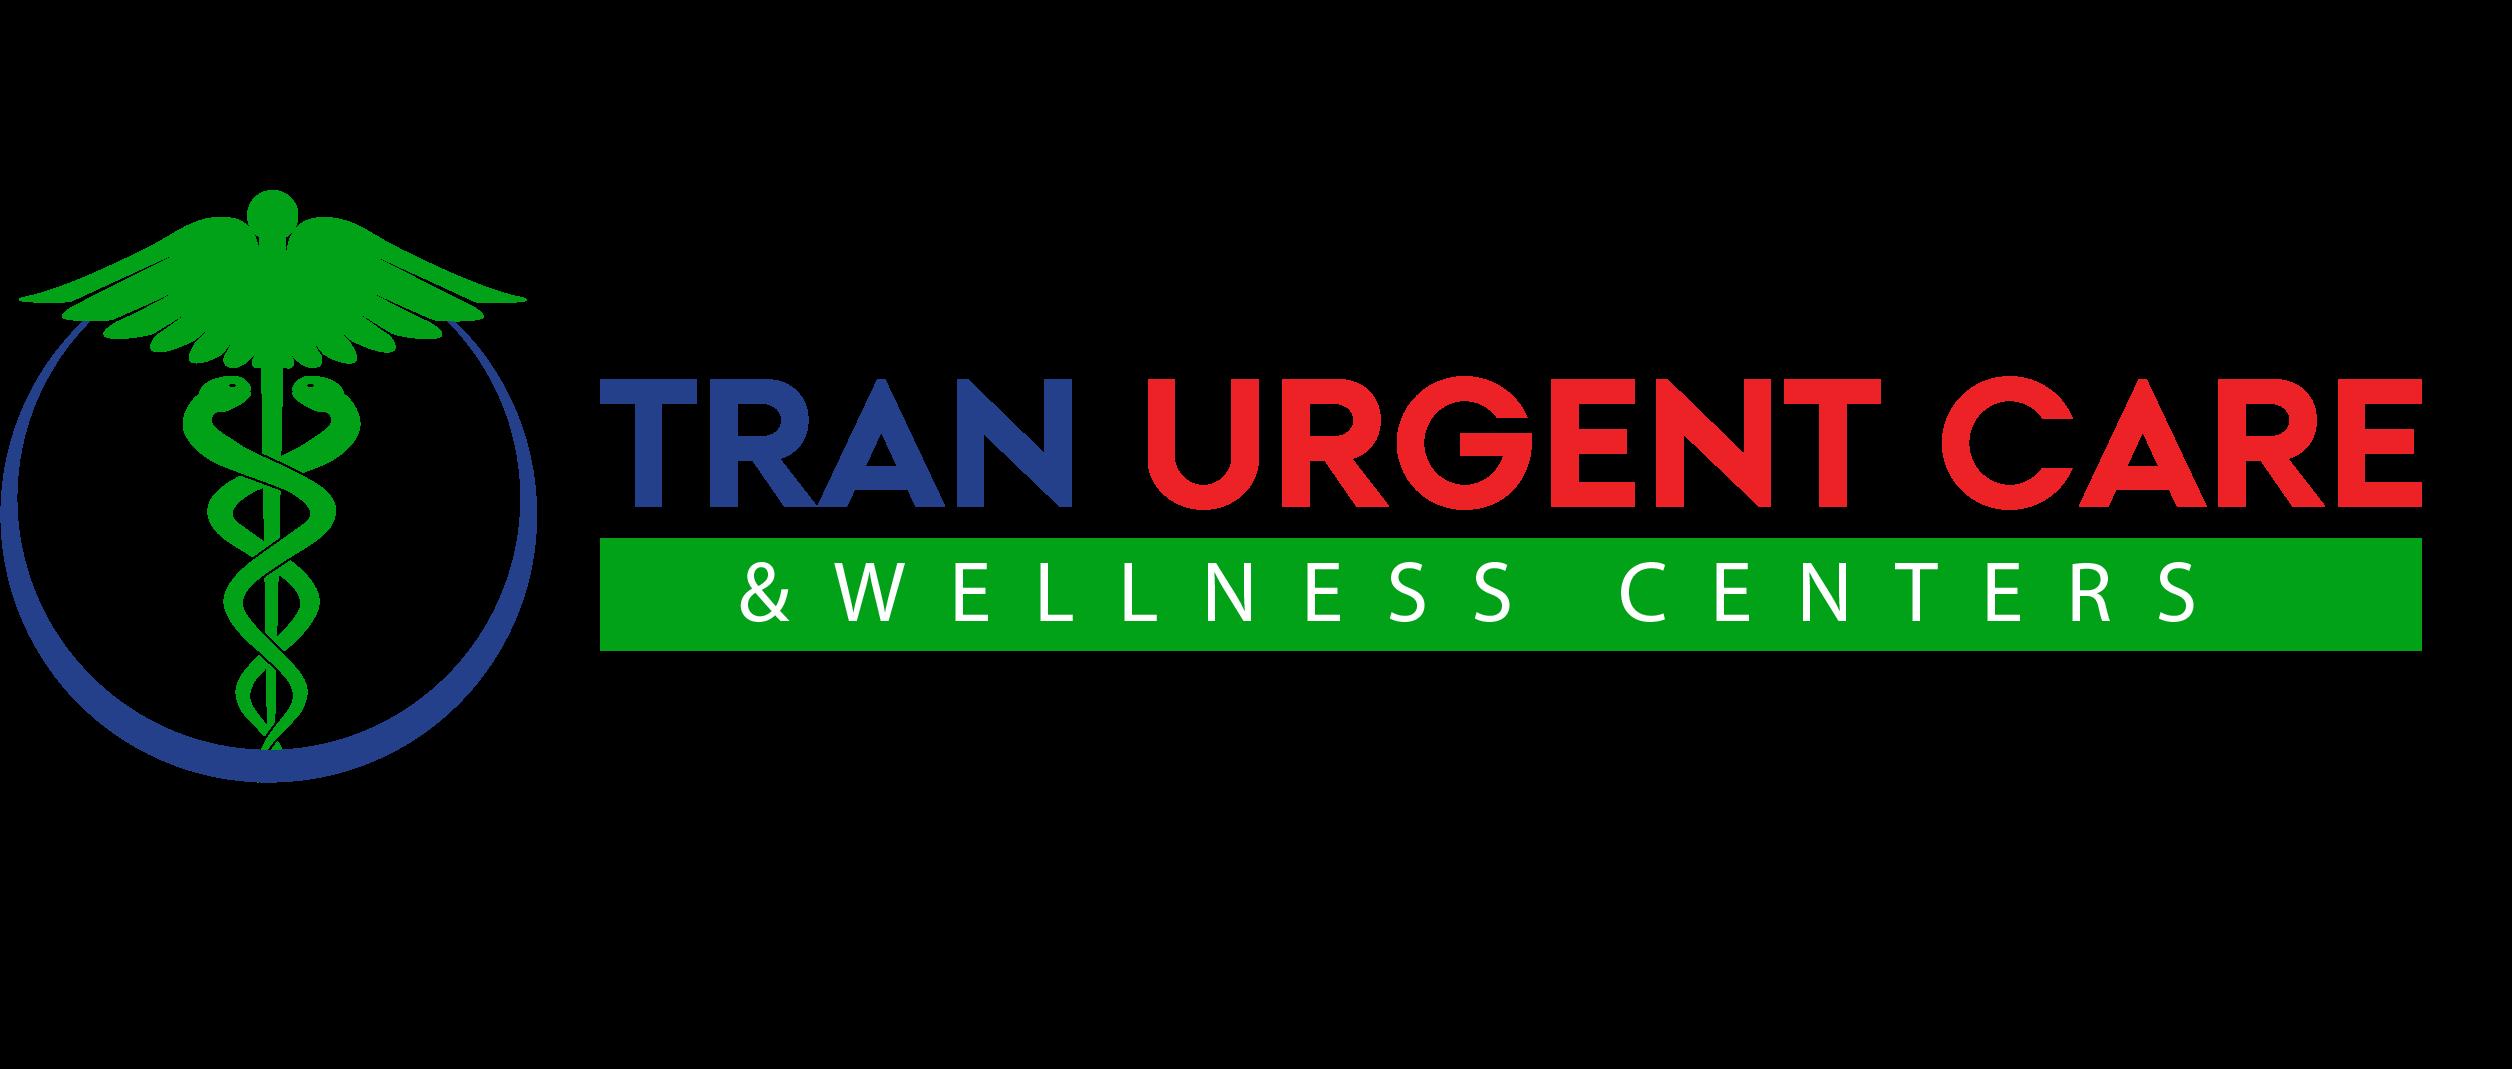 Tran Urgent Care & Wellness Centers - Tacoma Logo